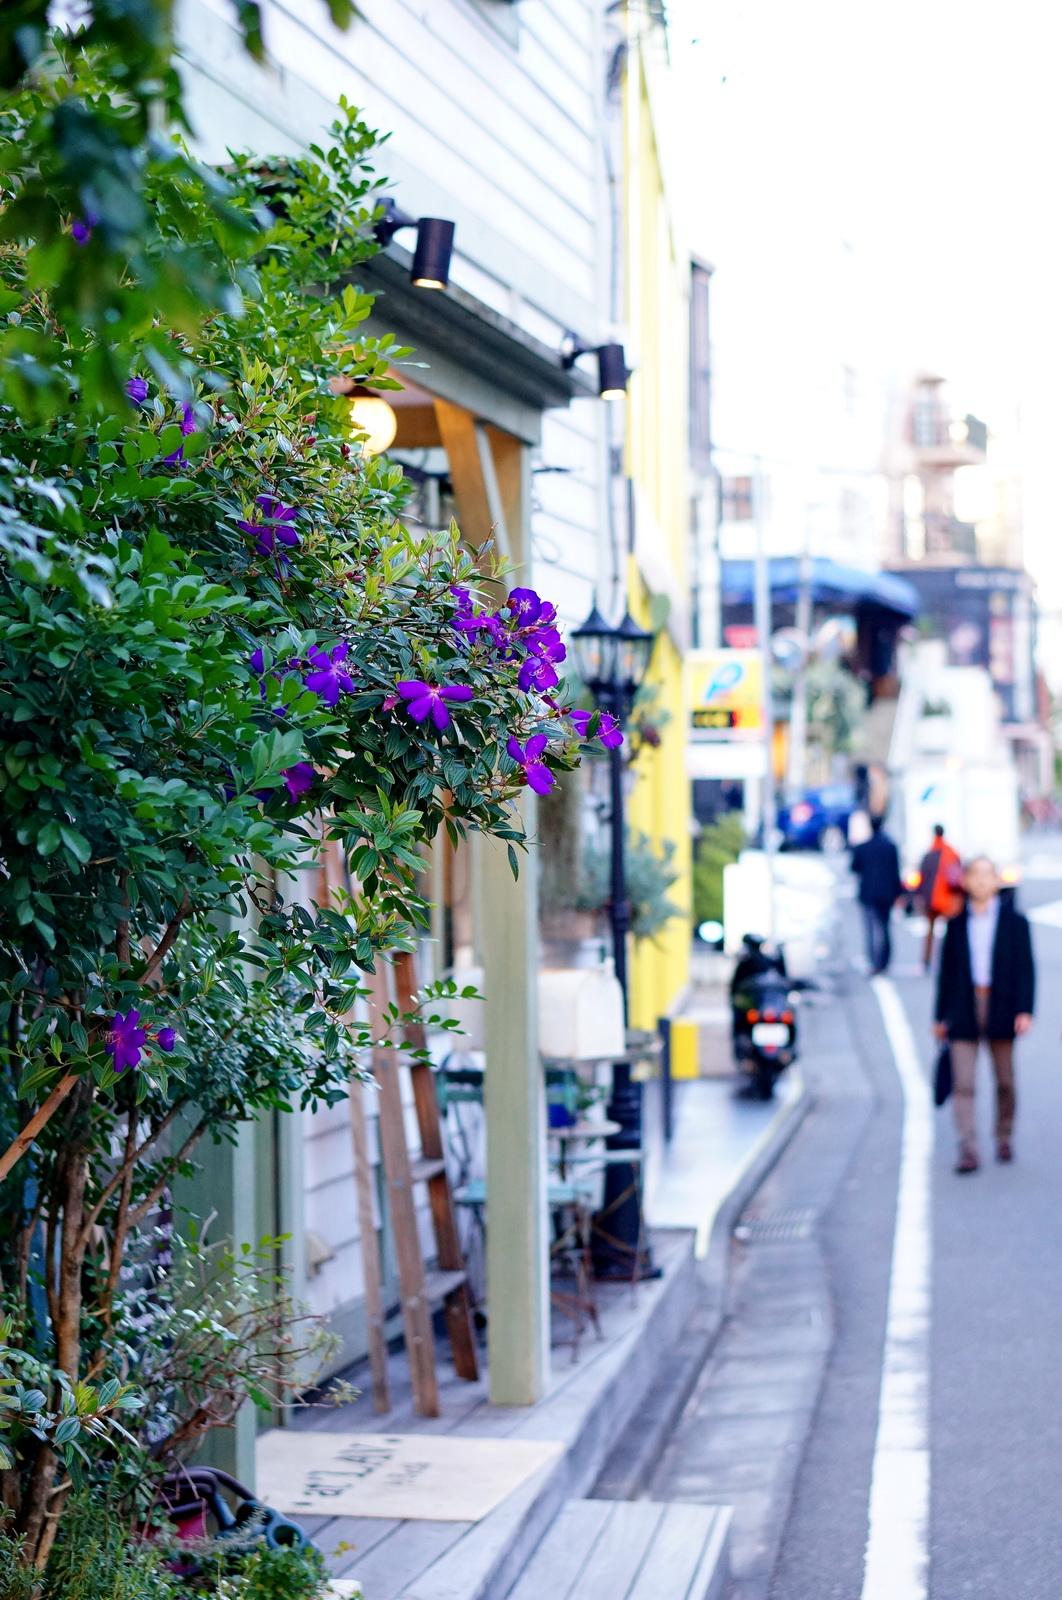 harajuku street, street life tokyo, city life tokyo